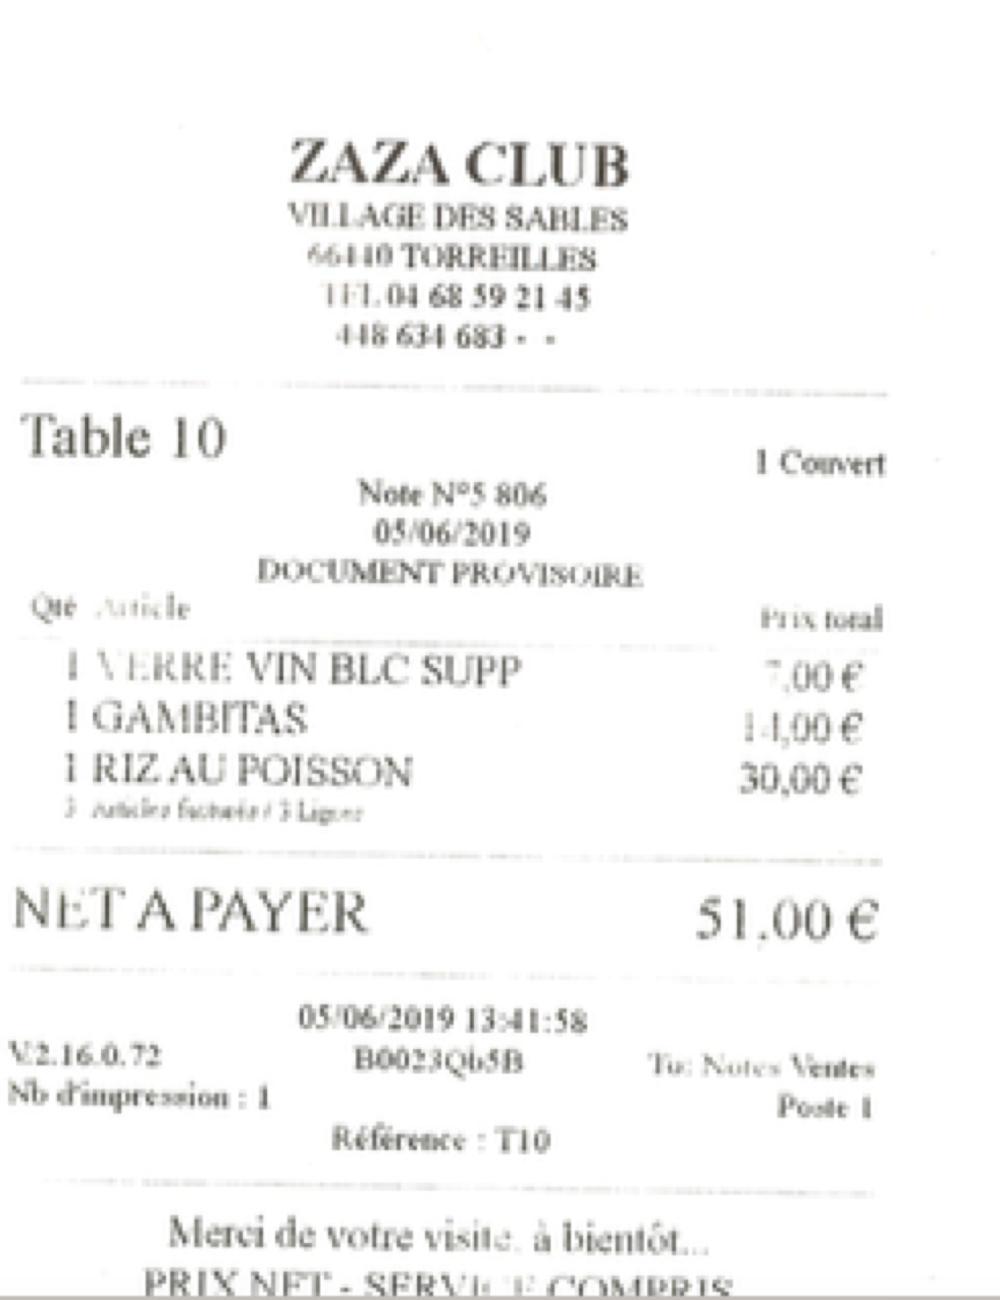 15_04_42_320_66_Zaza_Club.png